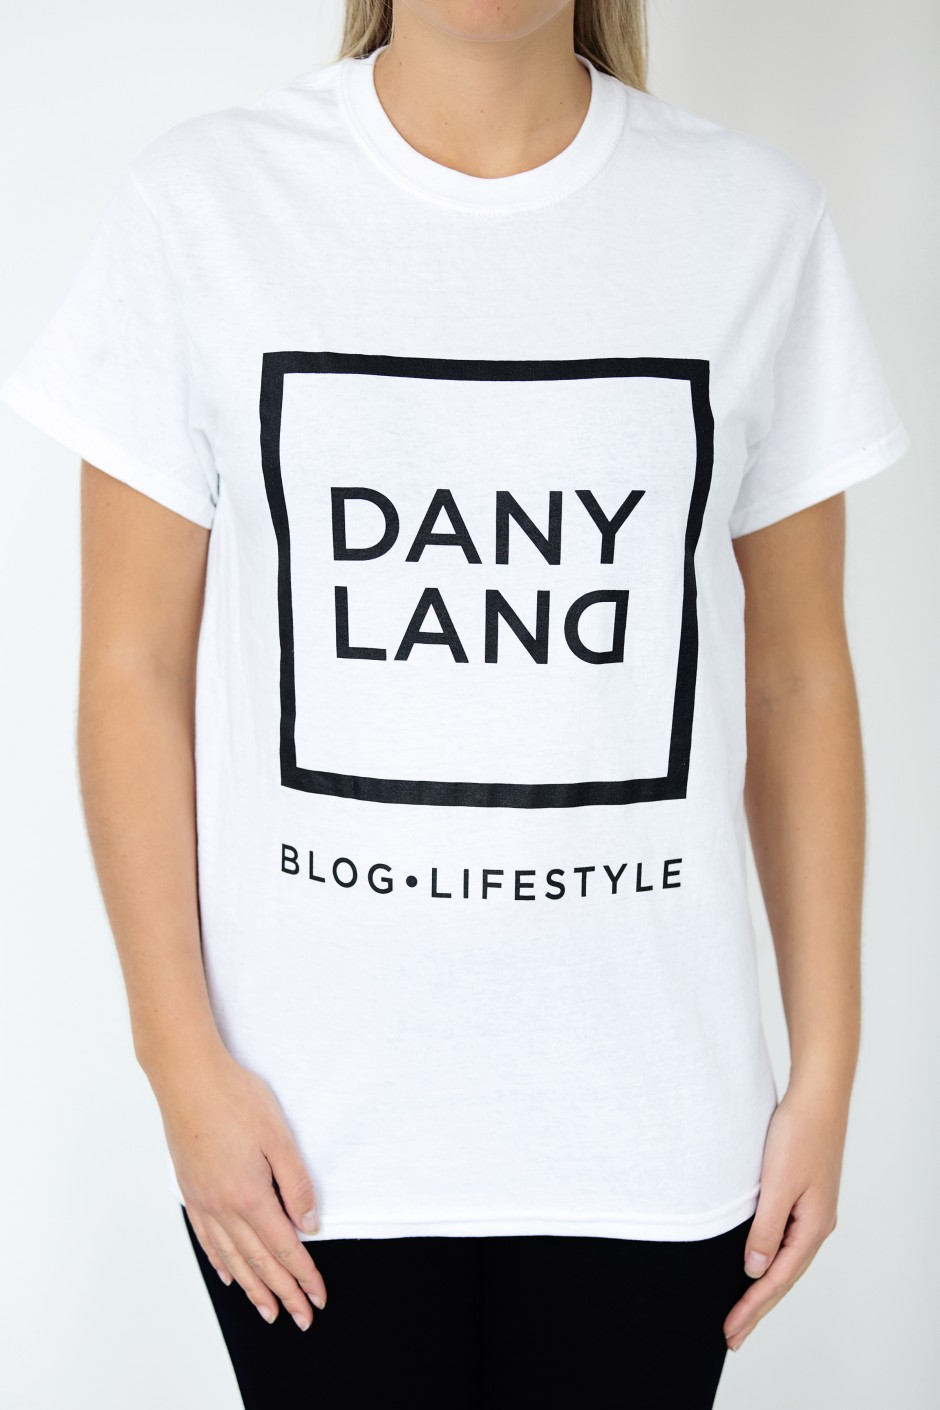 Danyland T-shirt